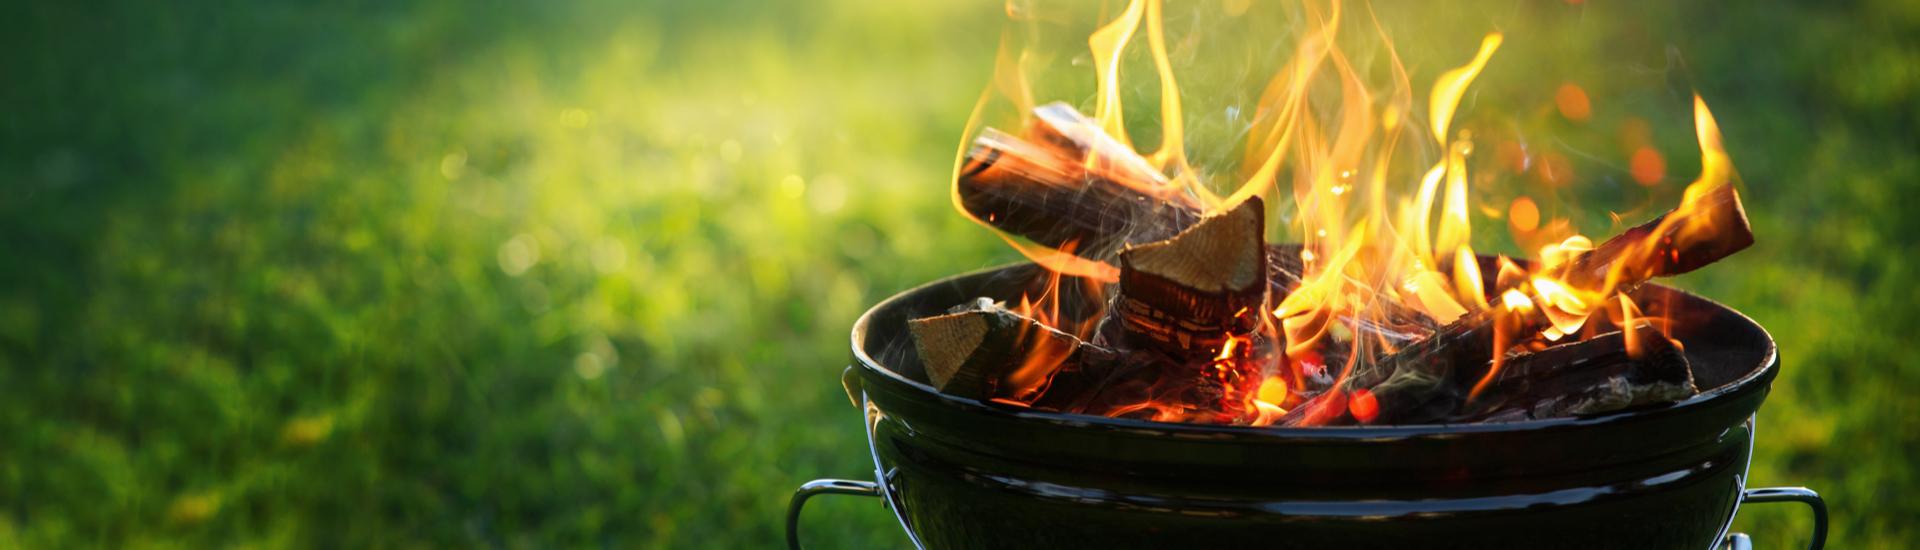 Campfire Grills